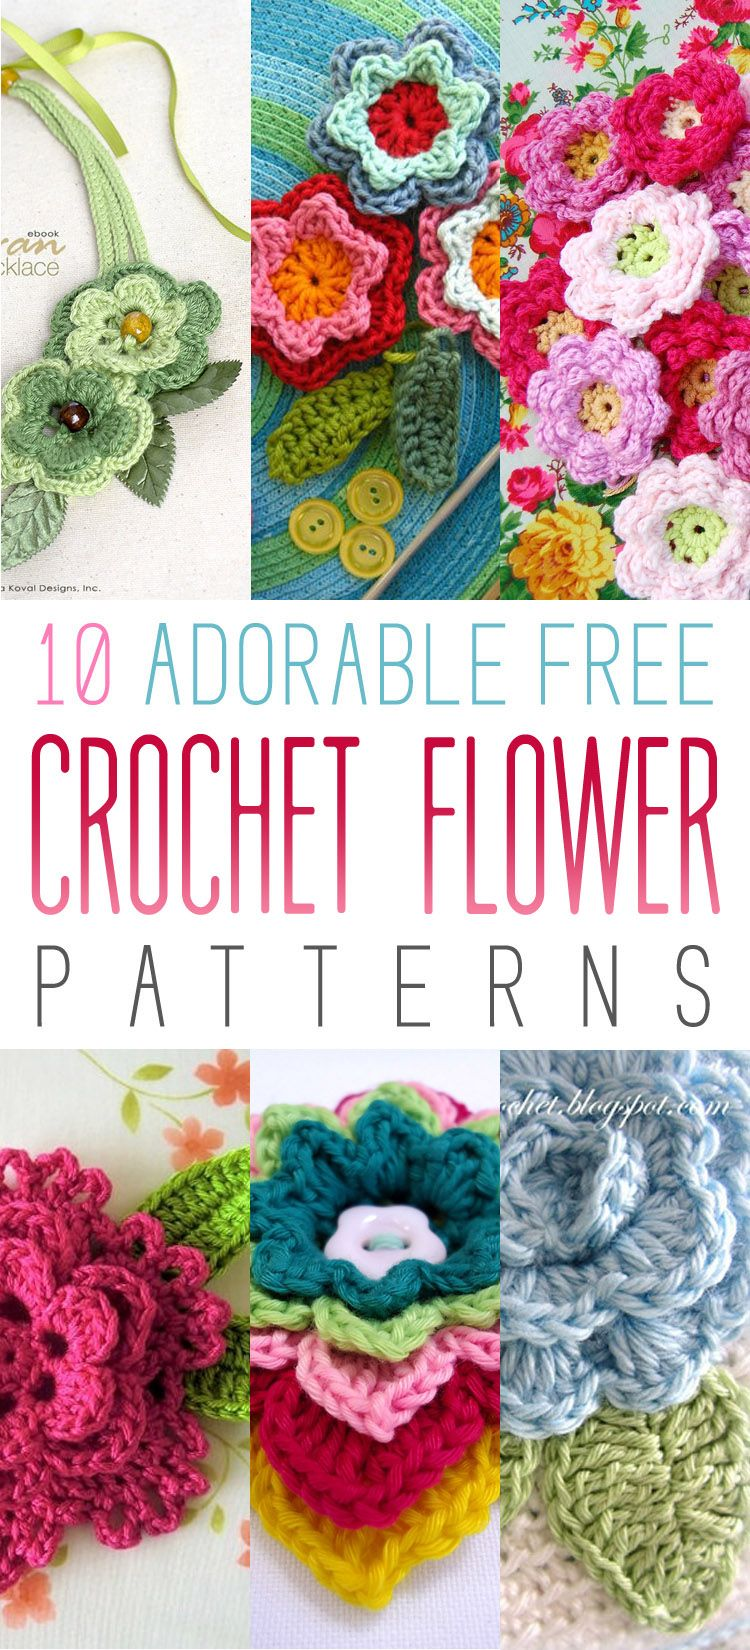 10 Adorable Free Crochet Flower Patterns | Flores, Ganchillo y Tejido